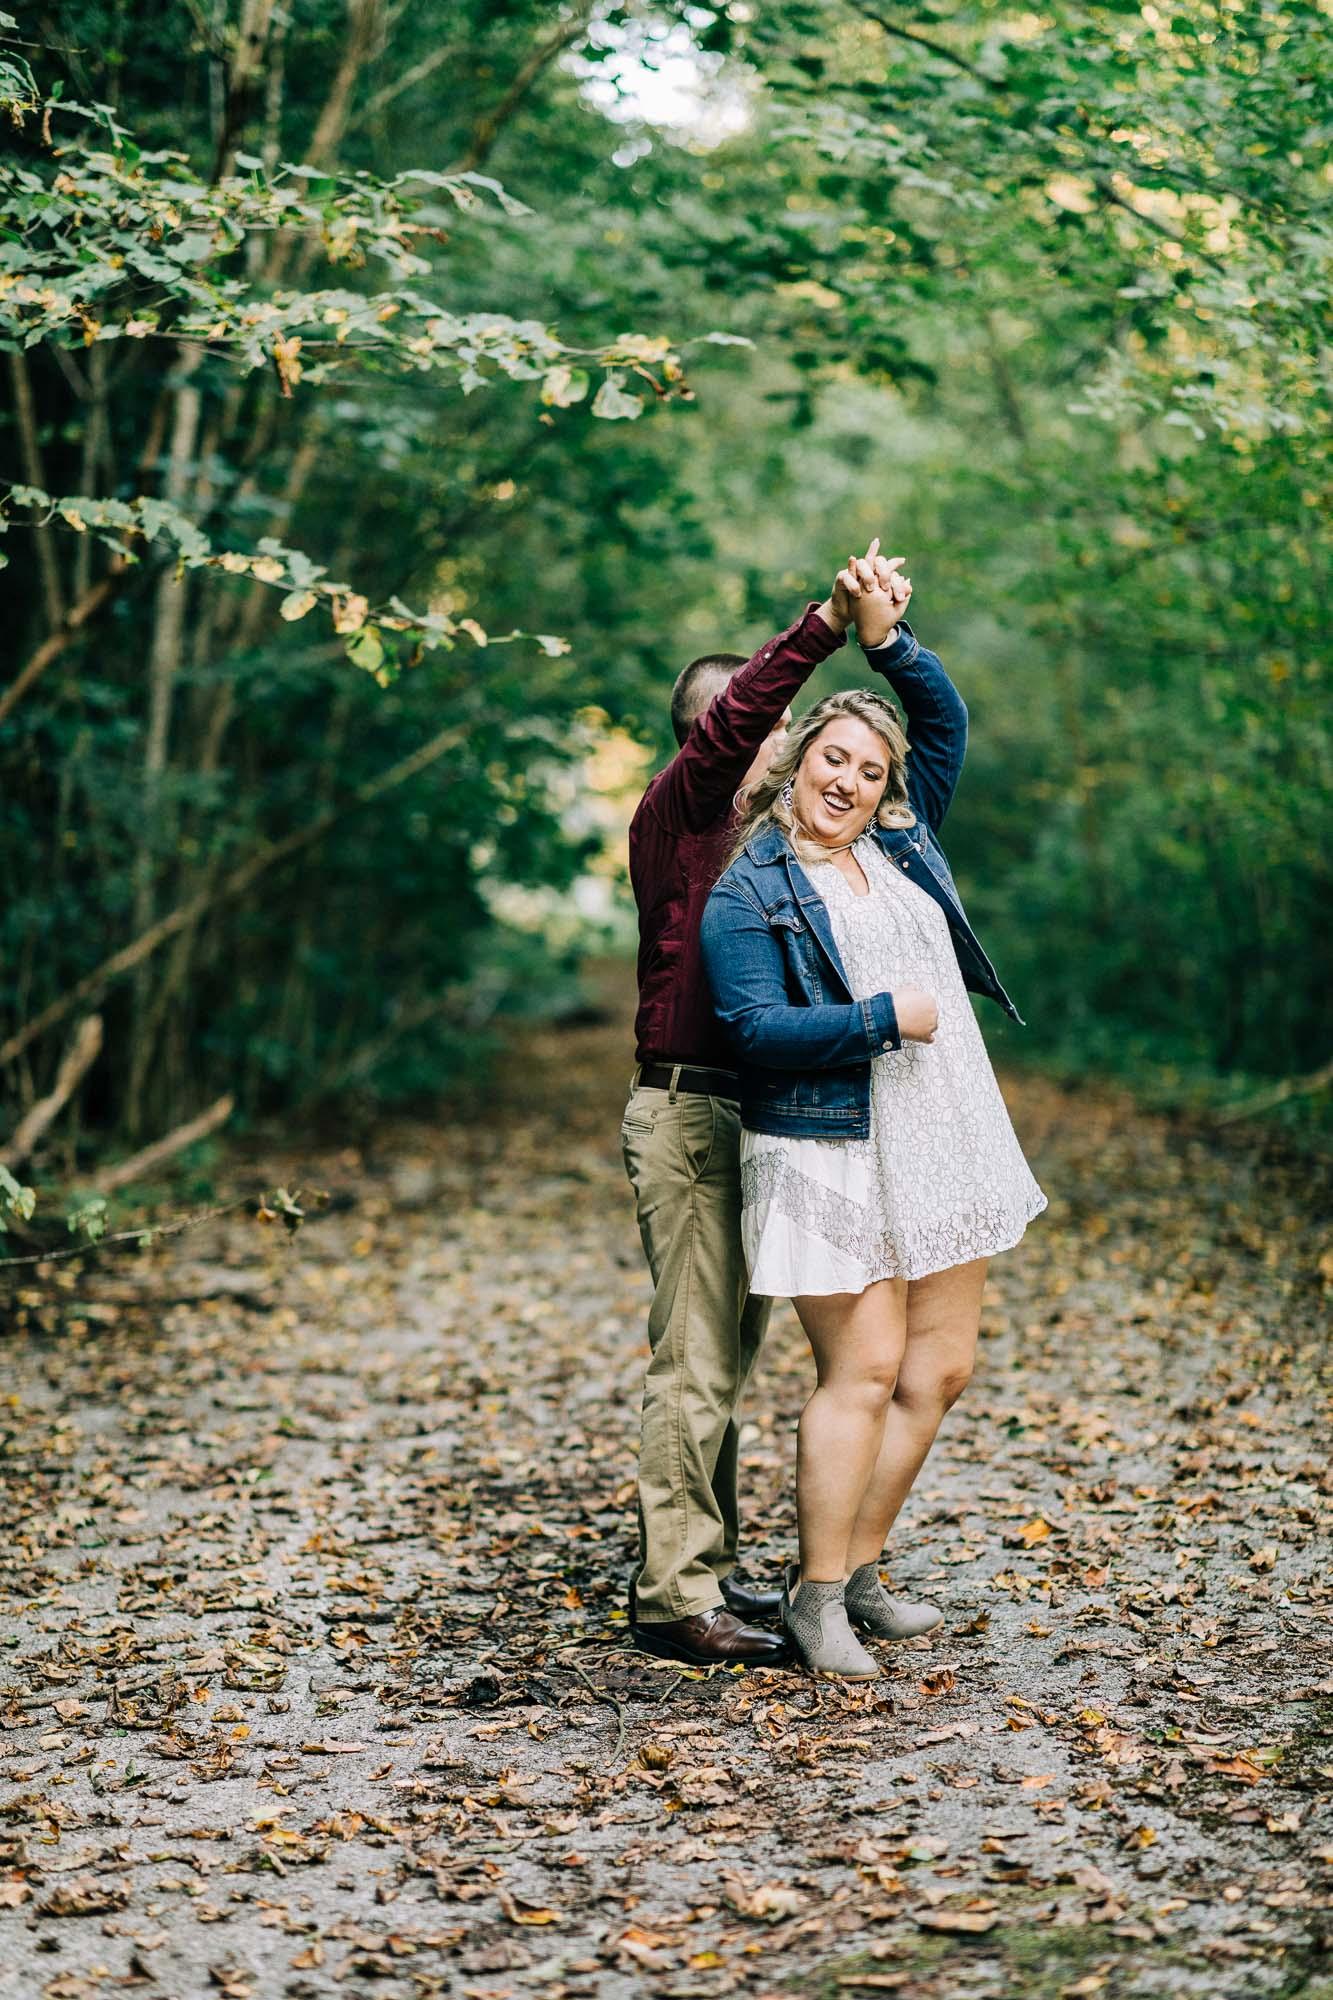 nicole-dumond-photography-engagement-7133.jpg